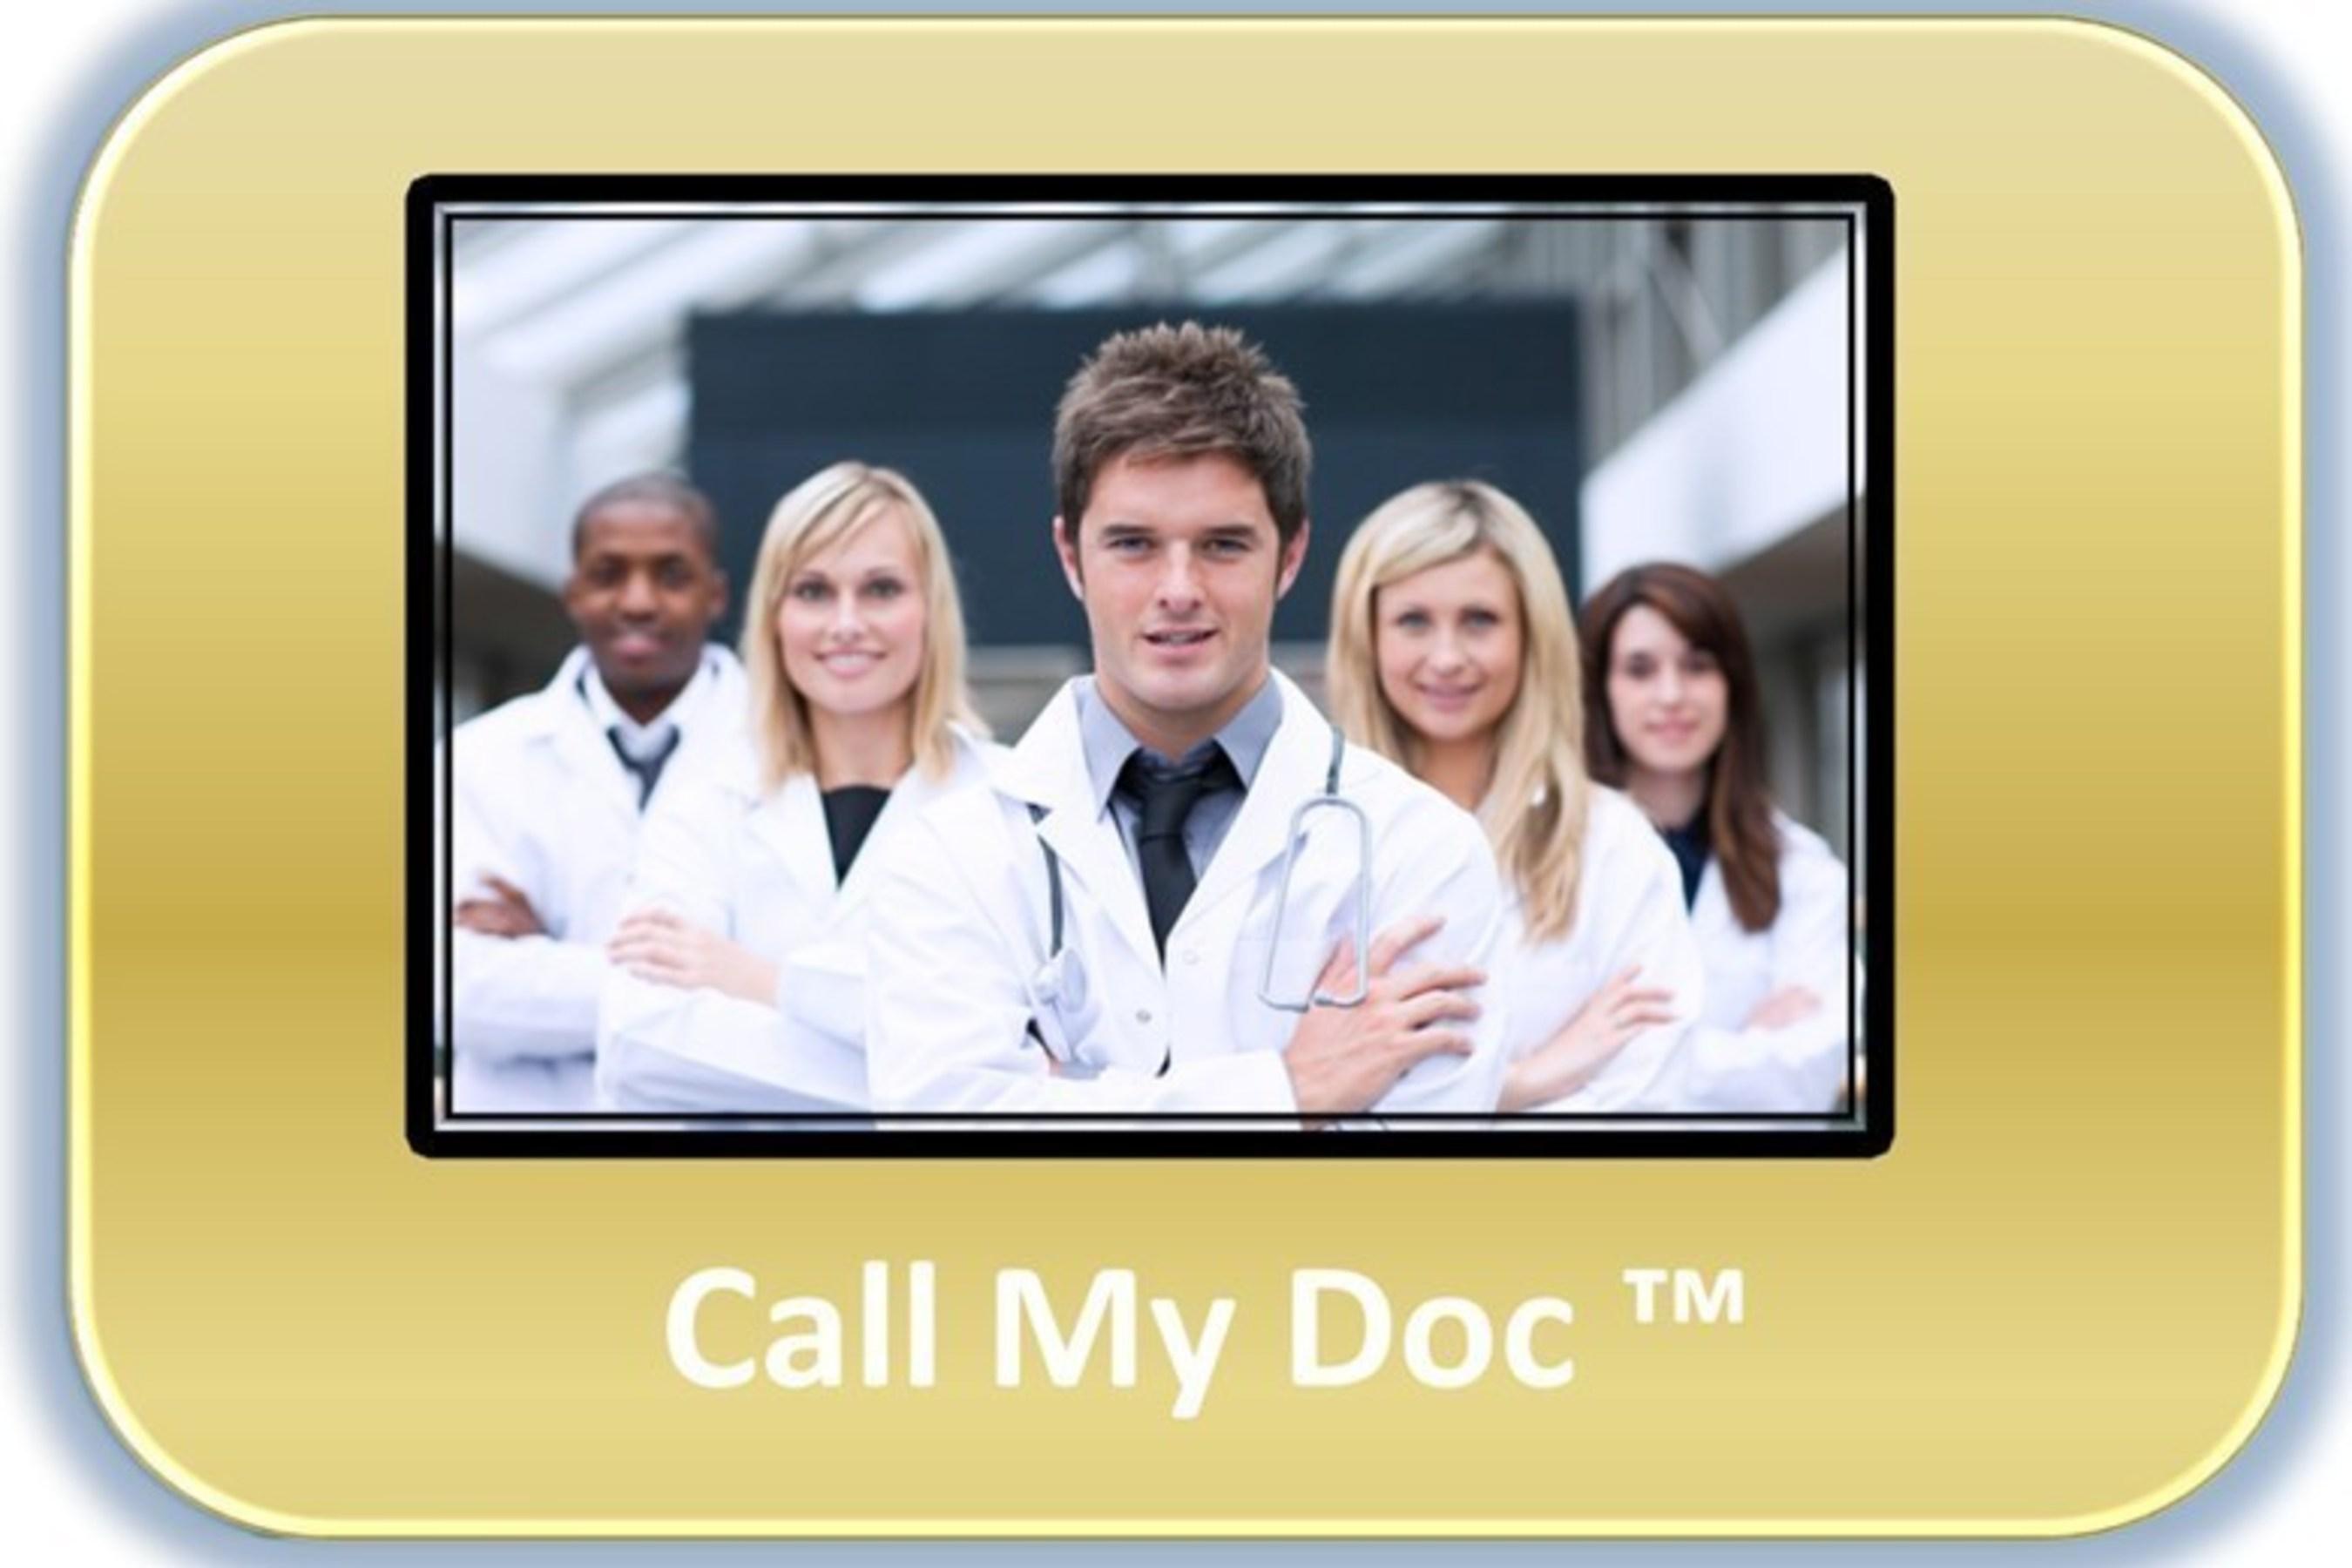 Call My Doc